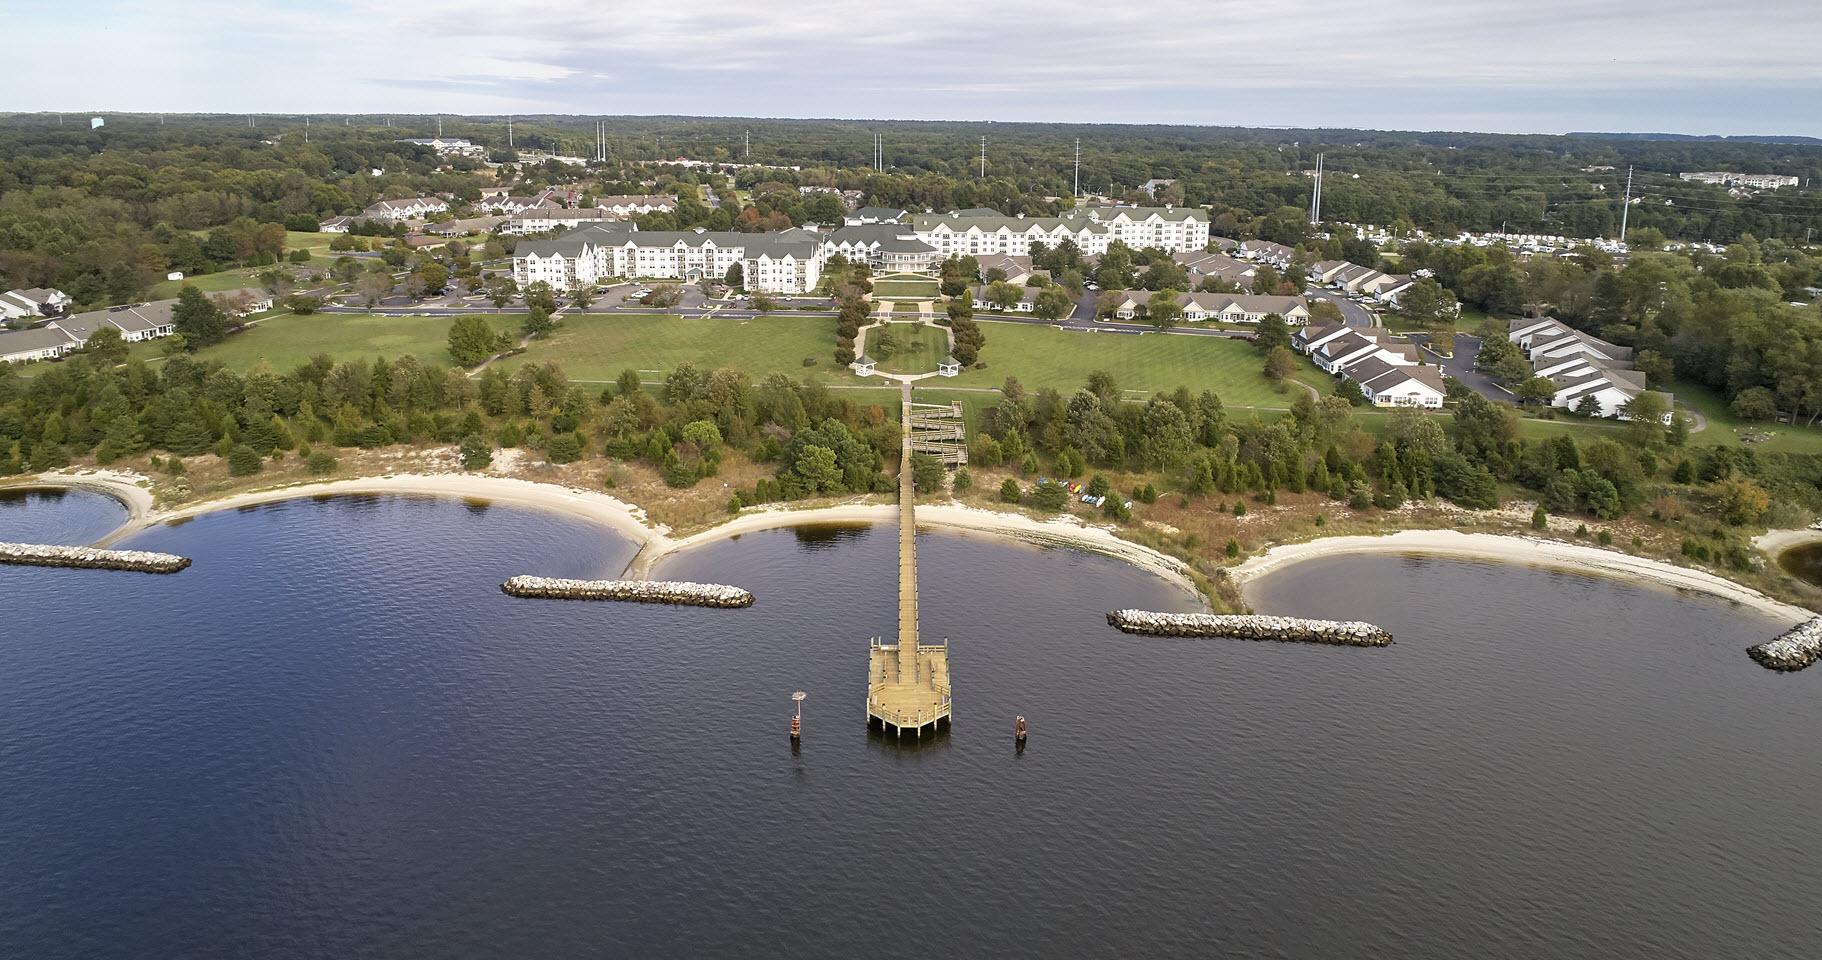 aerial view of asbury solomons